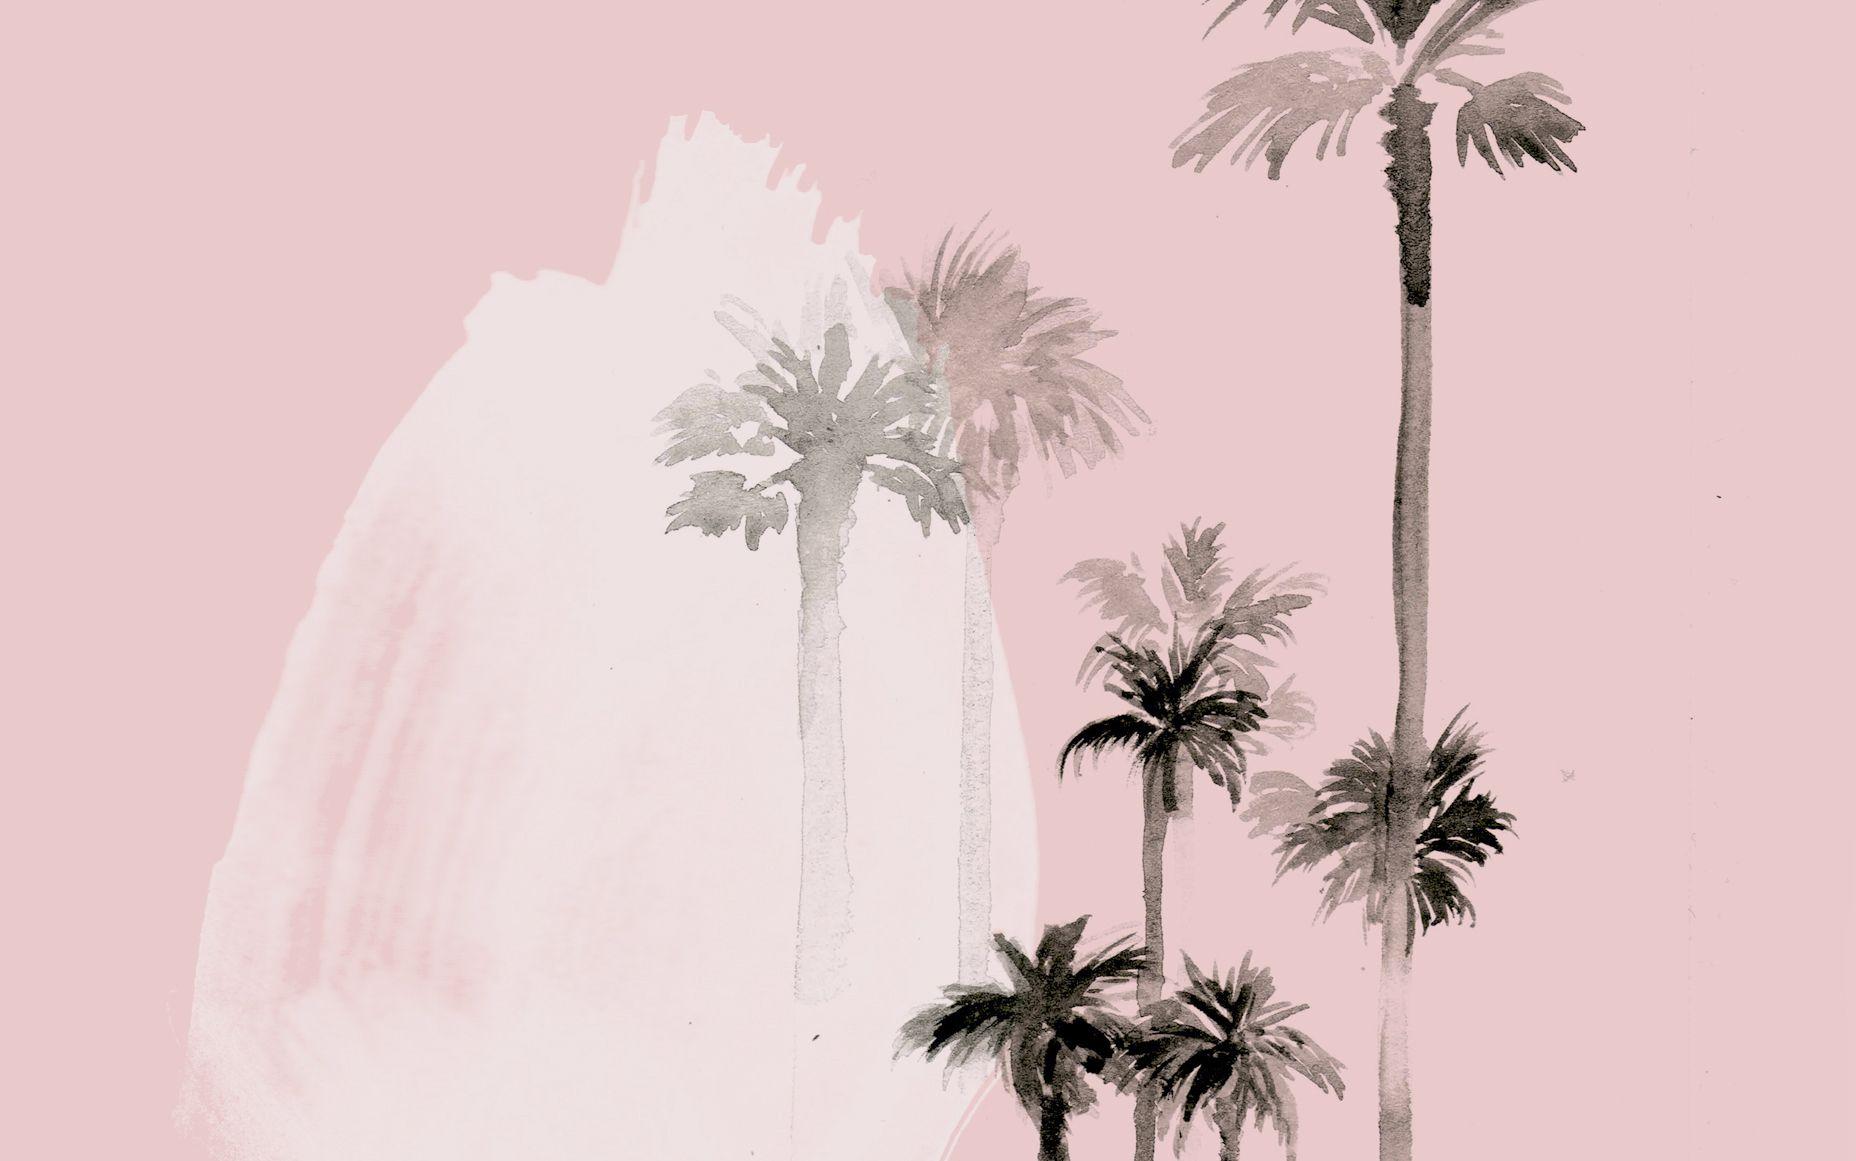 Black_palms.jpg (1856×1161)